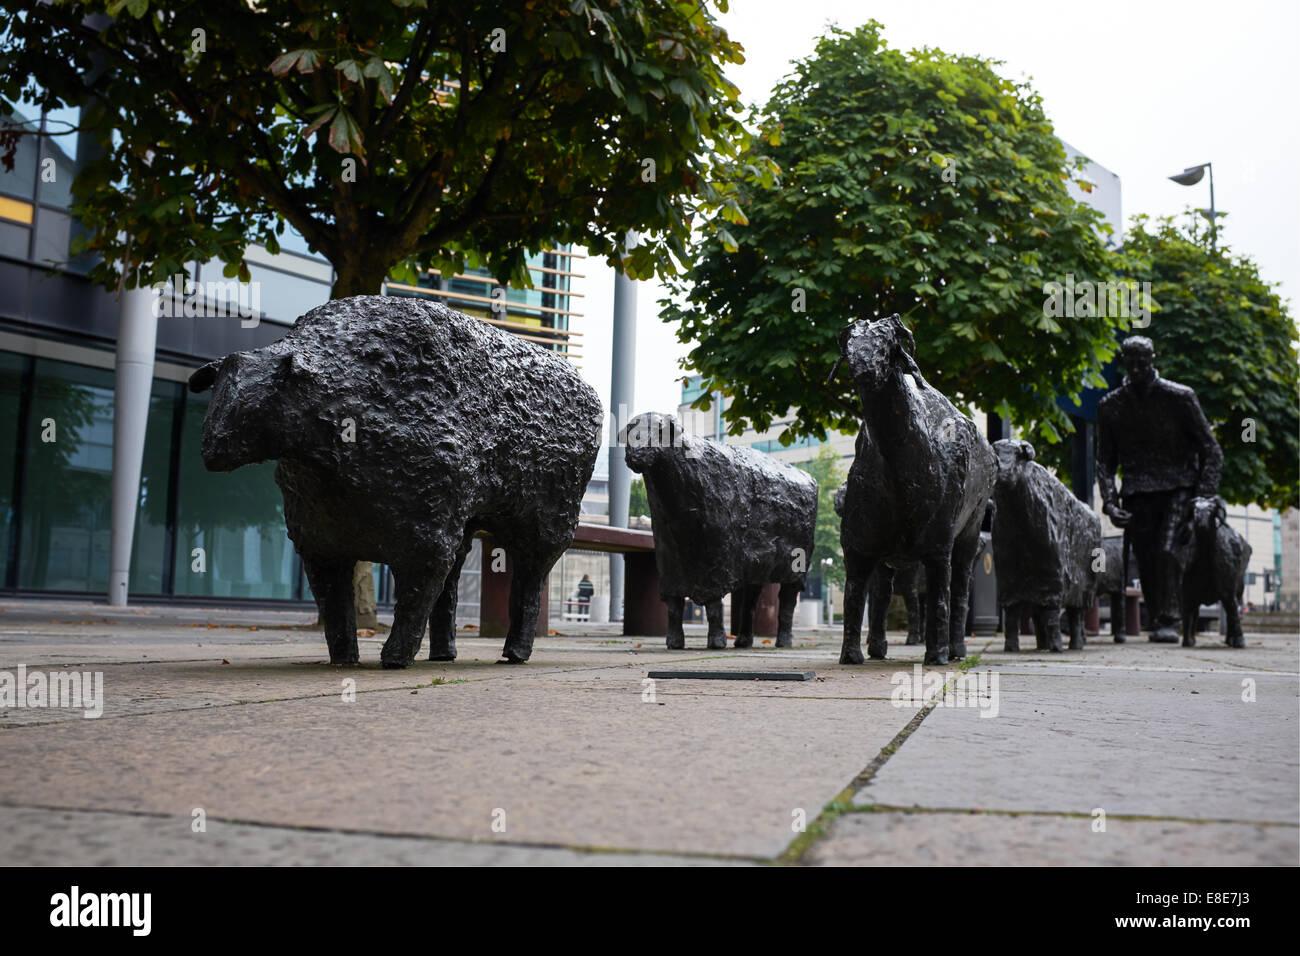 Sheep on the Road bronze sculpture by Deborah Brown in Belfast city centre - Stock Image